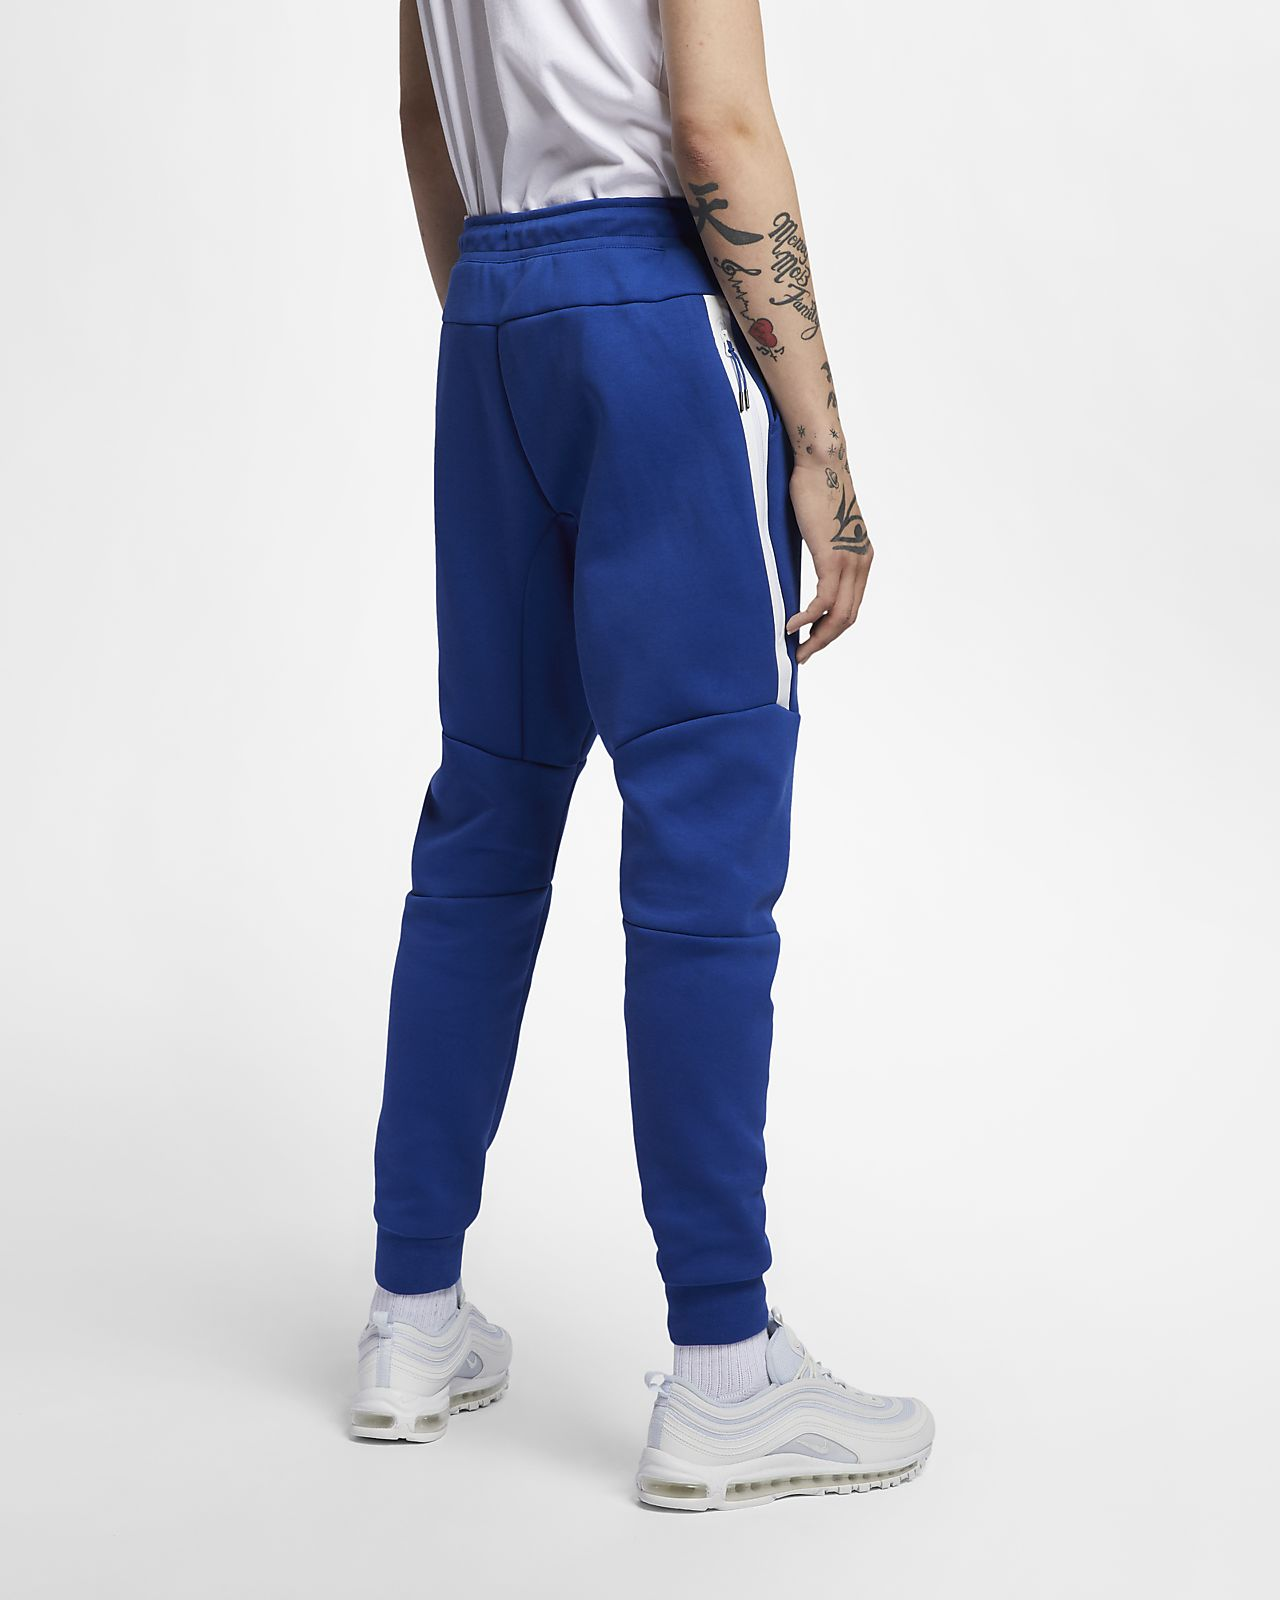 a1ebe27a31baa6 Nike Sportswear Tech Fleece Herren-Jogger. Nike.com DE